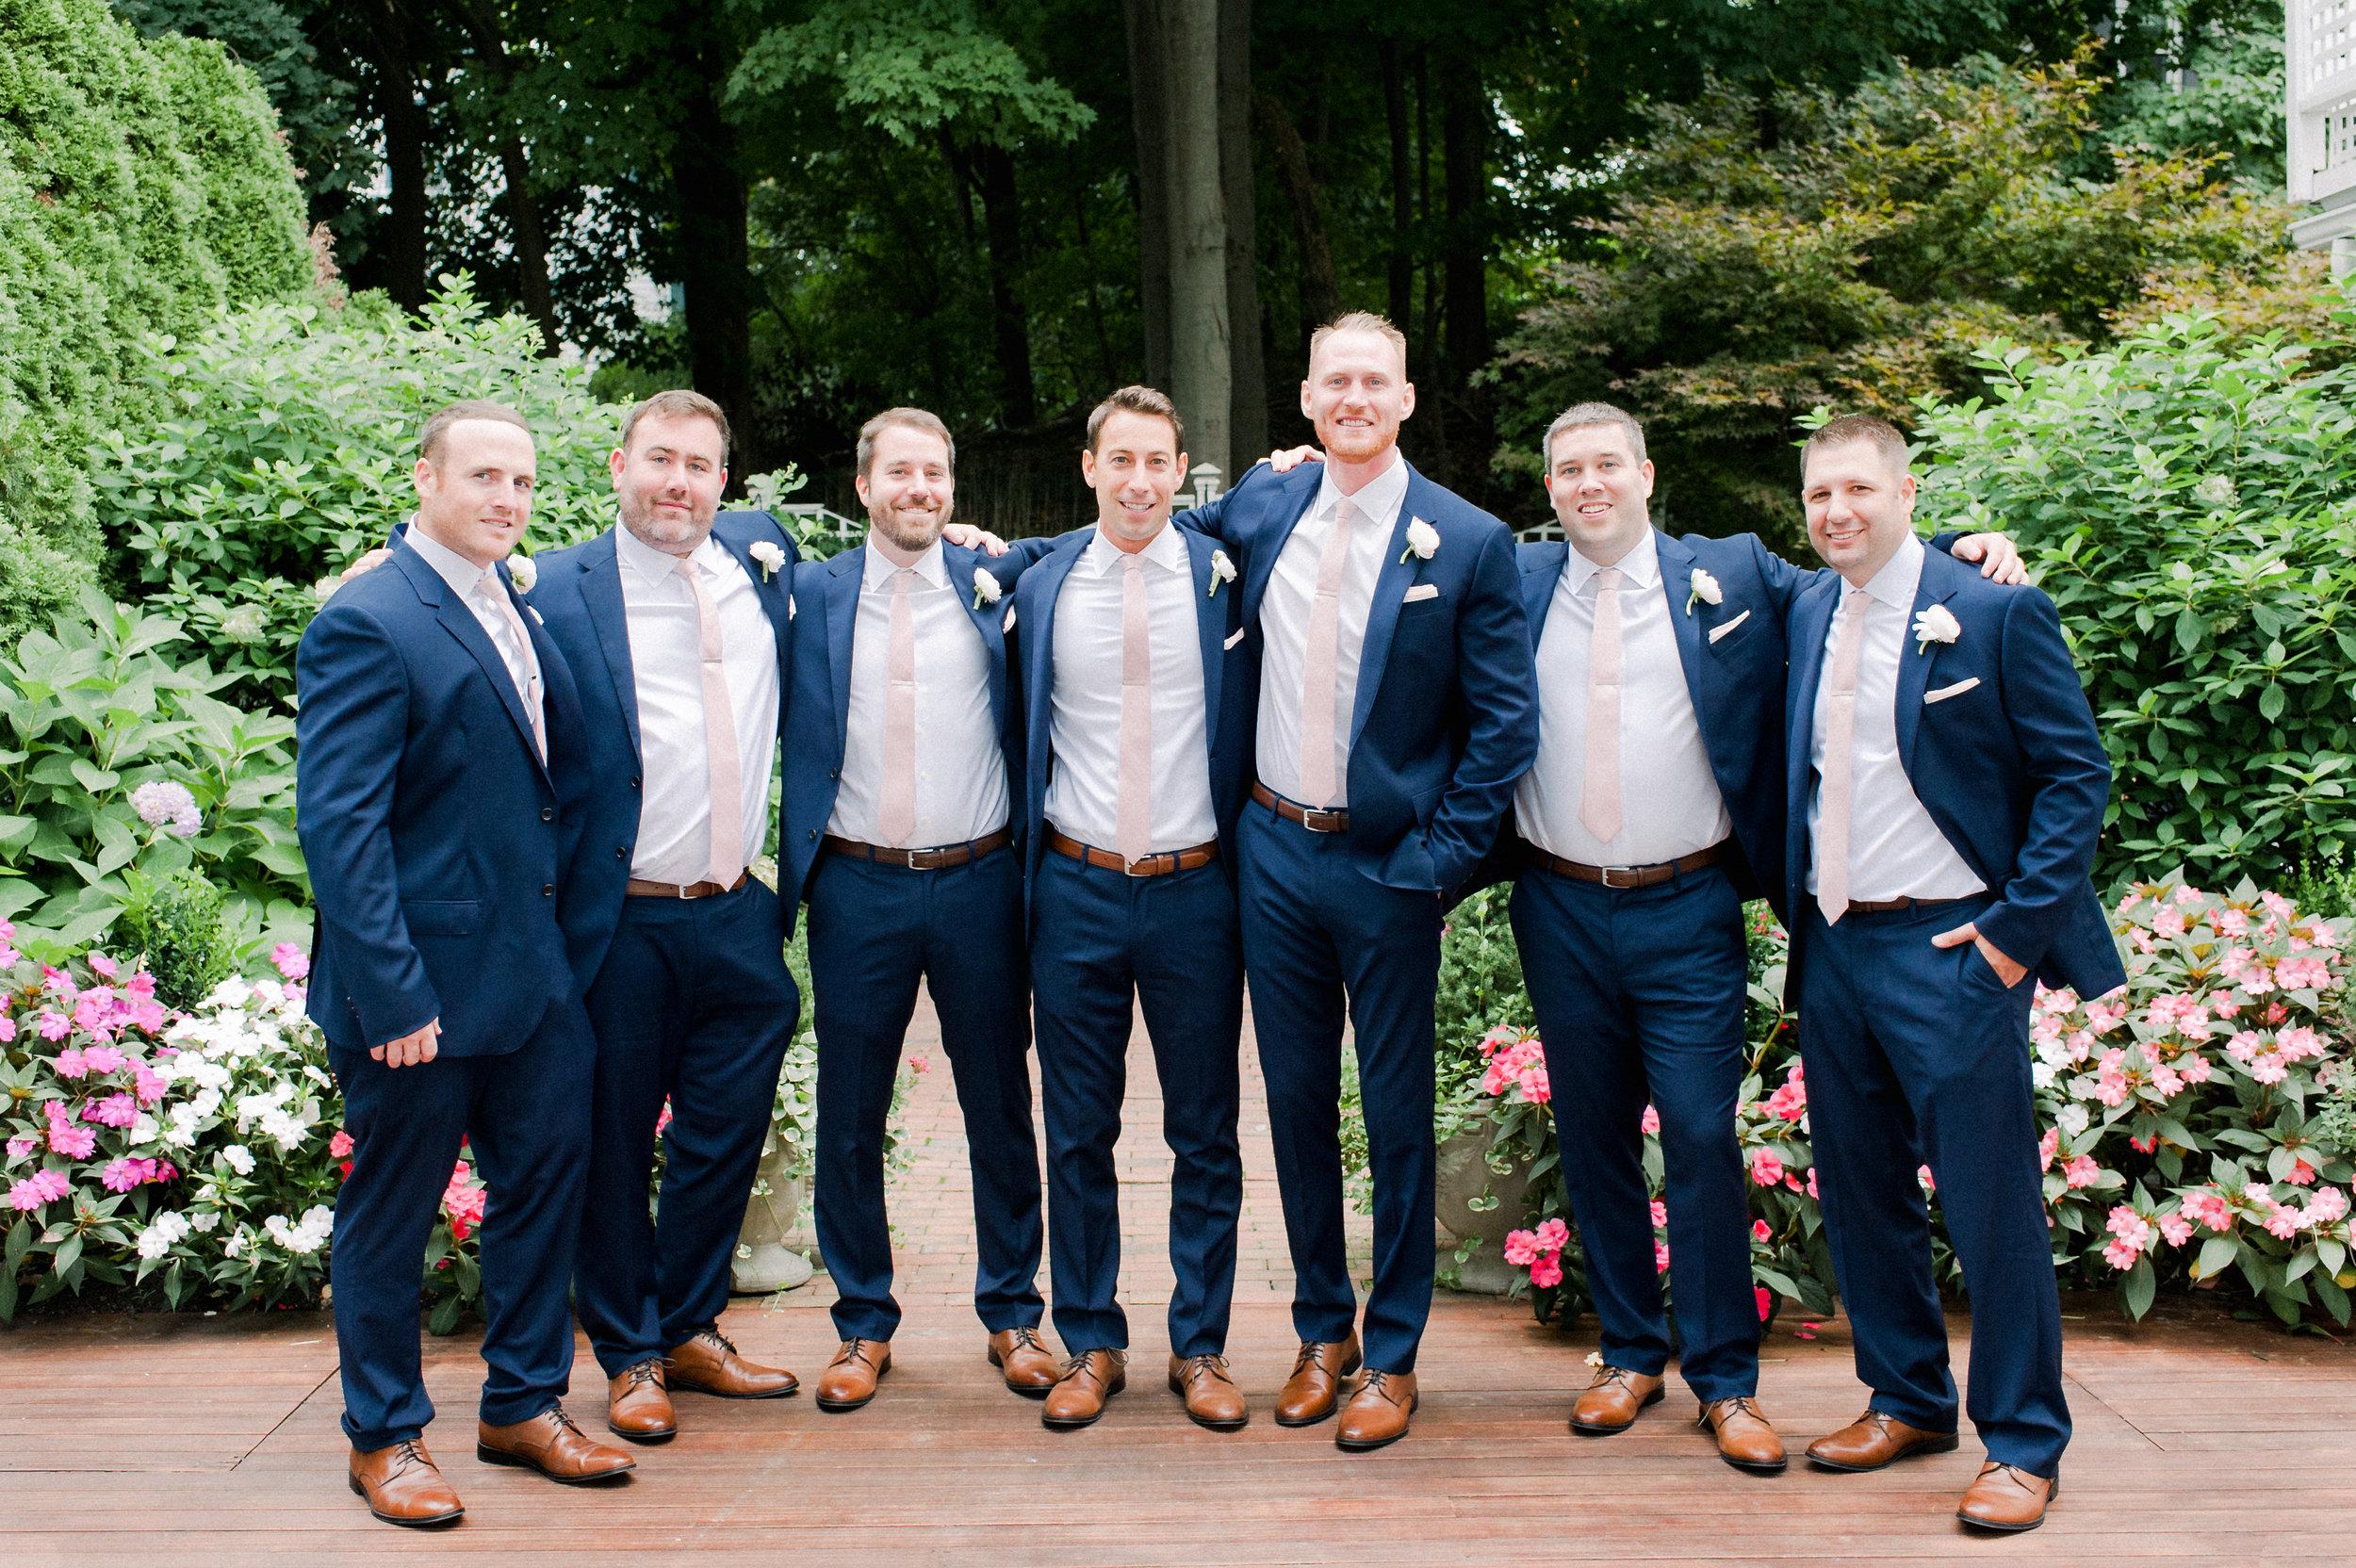 The Commons 1854 Topsfield MA wedding   Massachusetts wedding venue   Massachusetts wedding photos   North Shore MA Wedding photos   groomsmen photos   groomsmen portraits